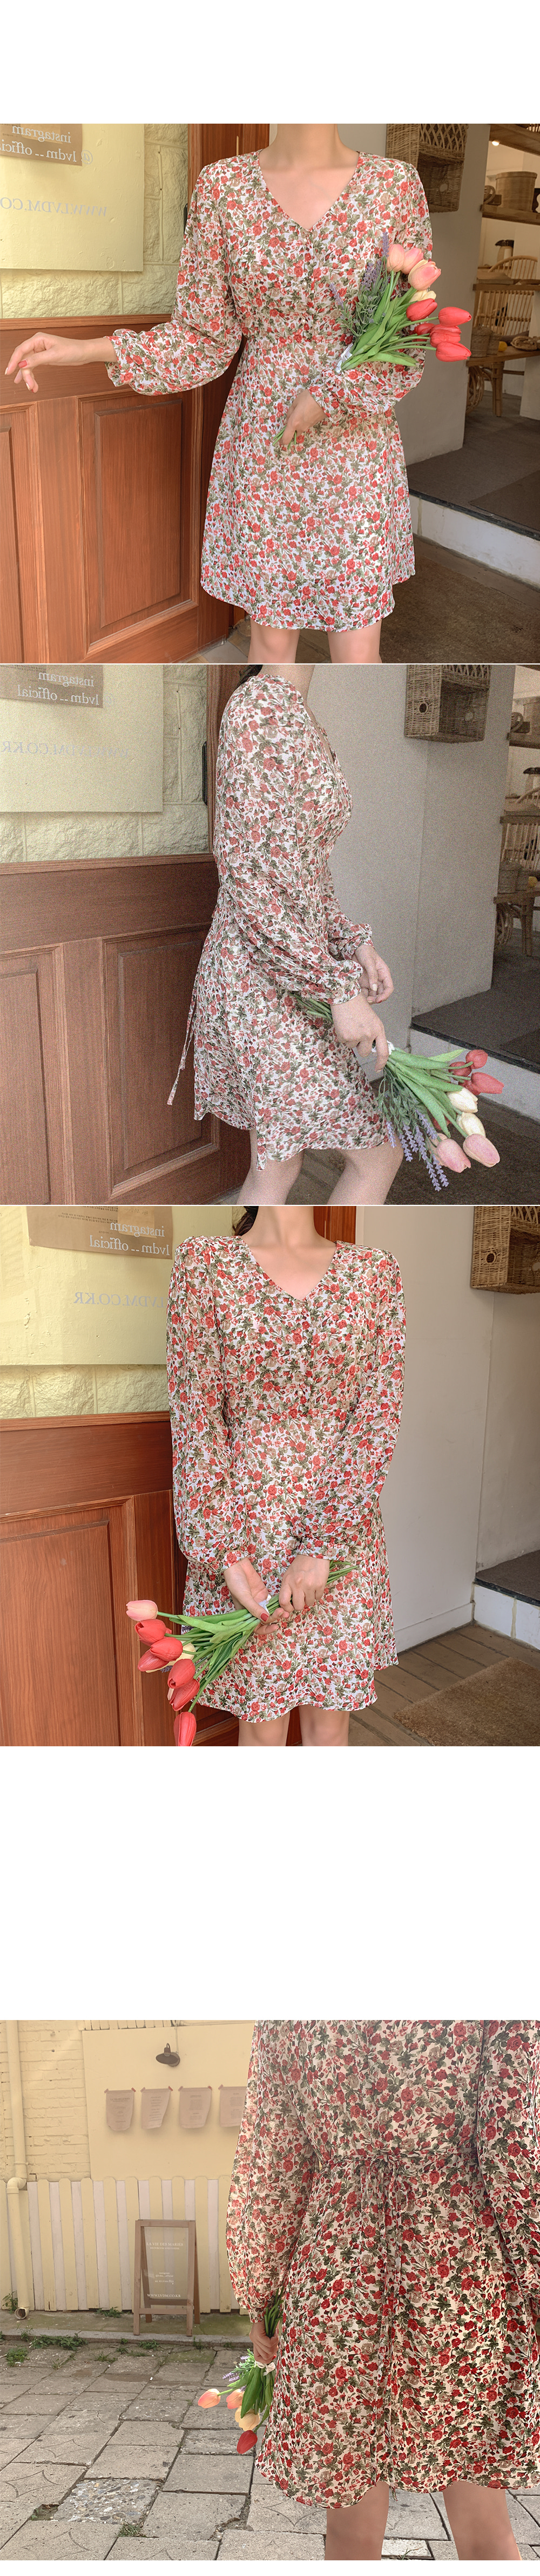 Tori flower dress